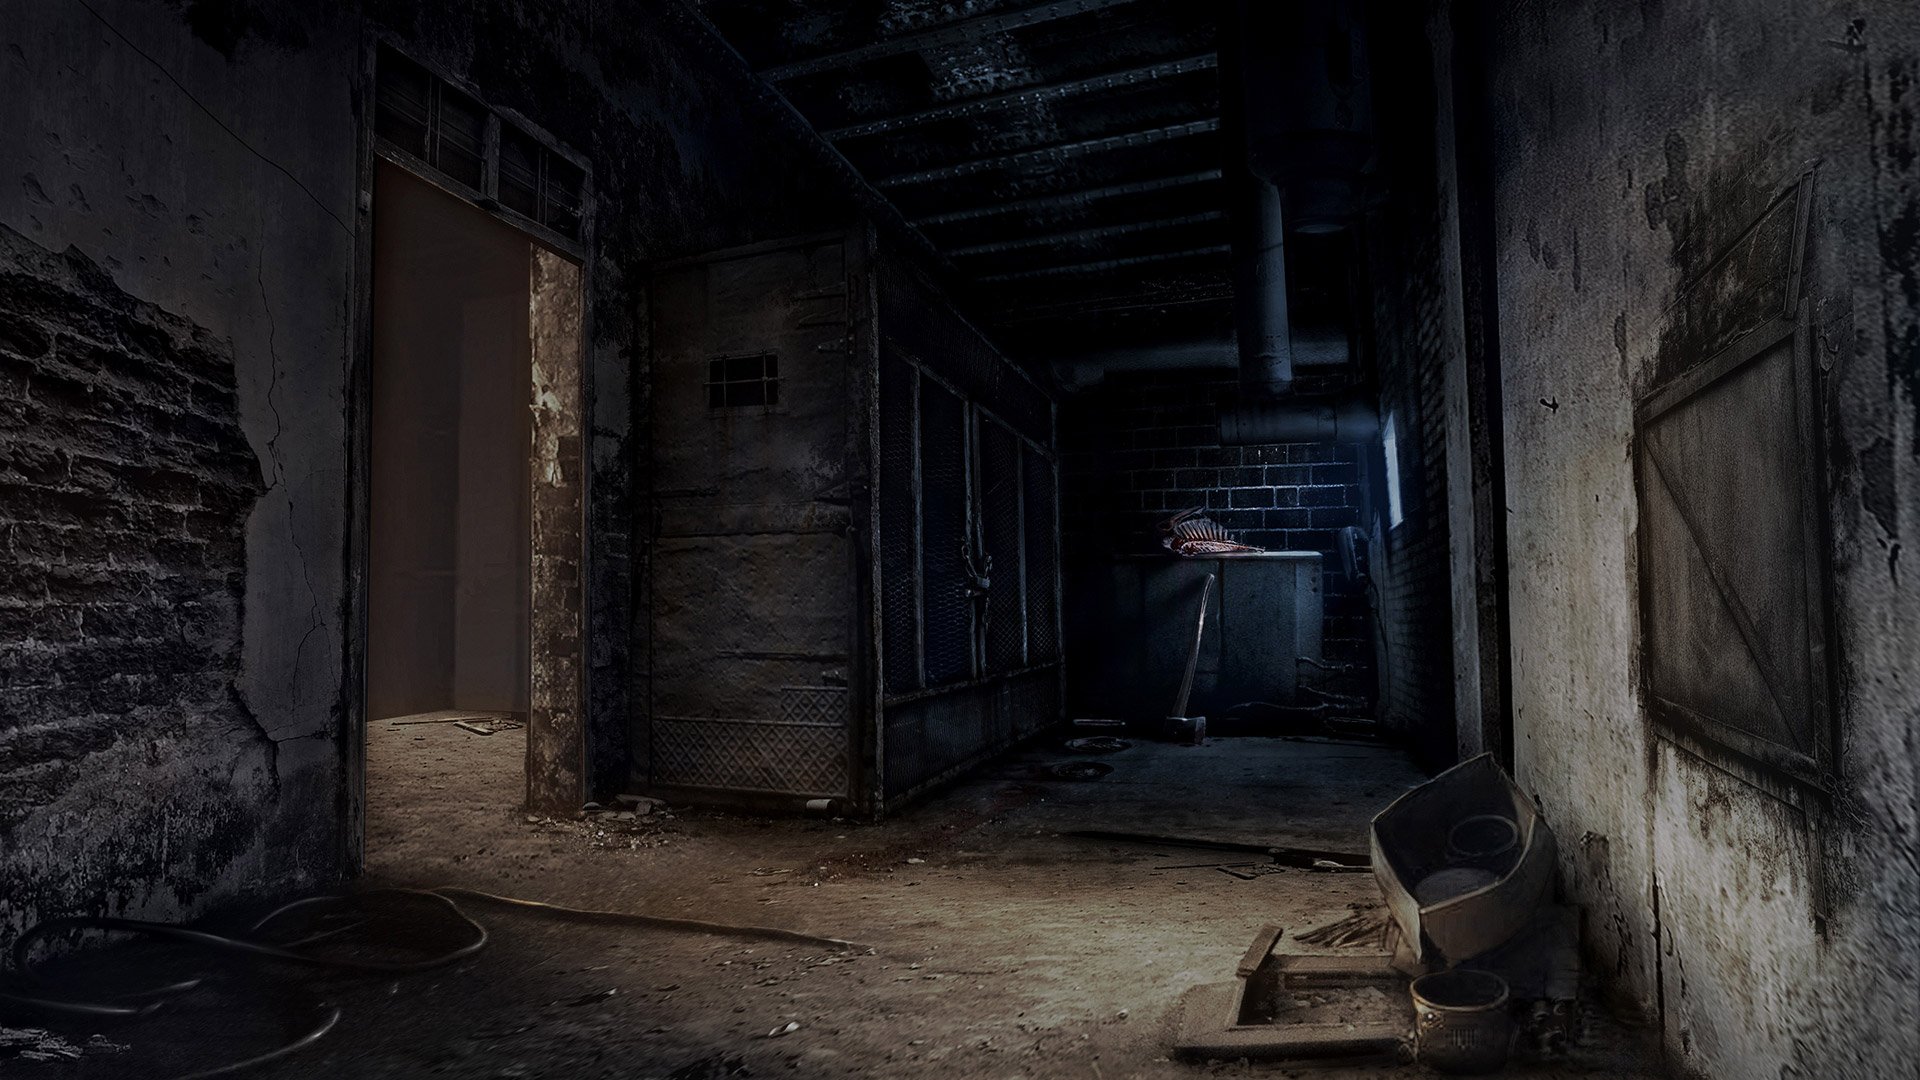 Free Alone in the Dark Wallpaper in 1920x1080